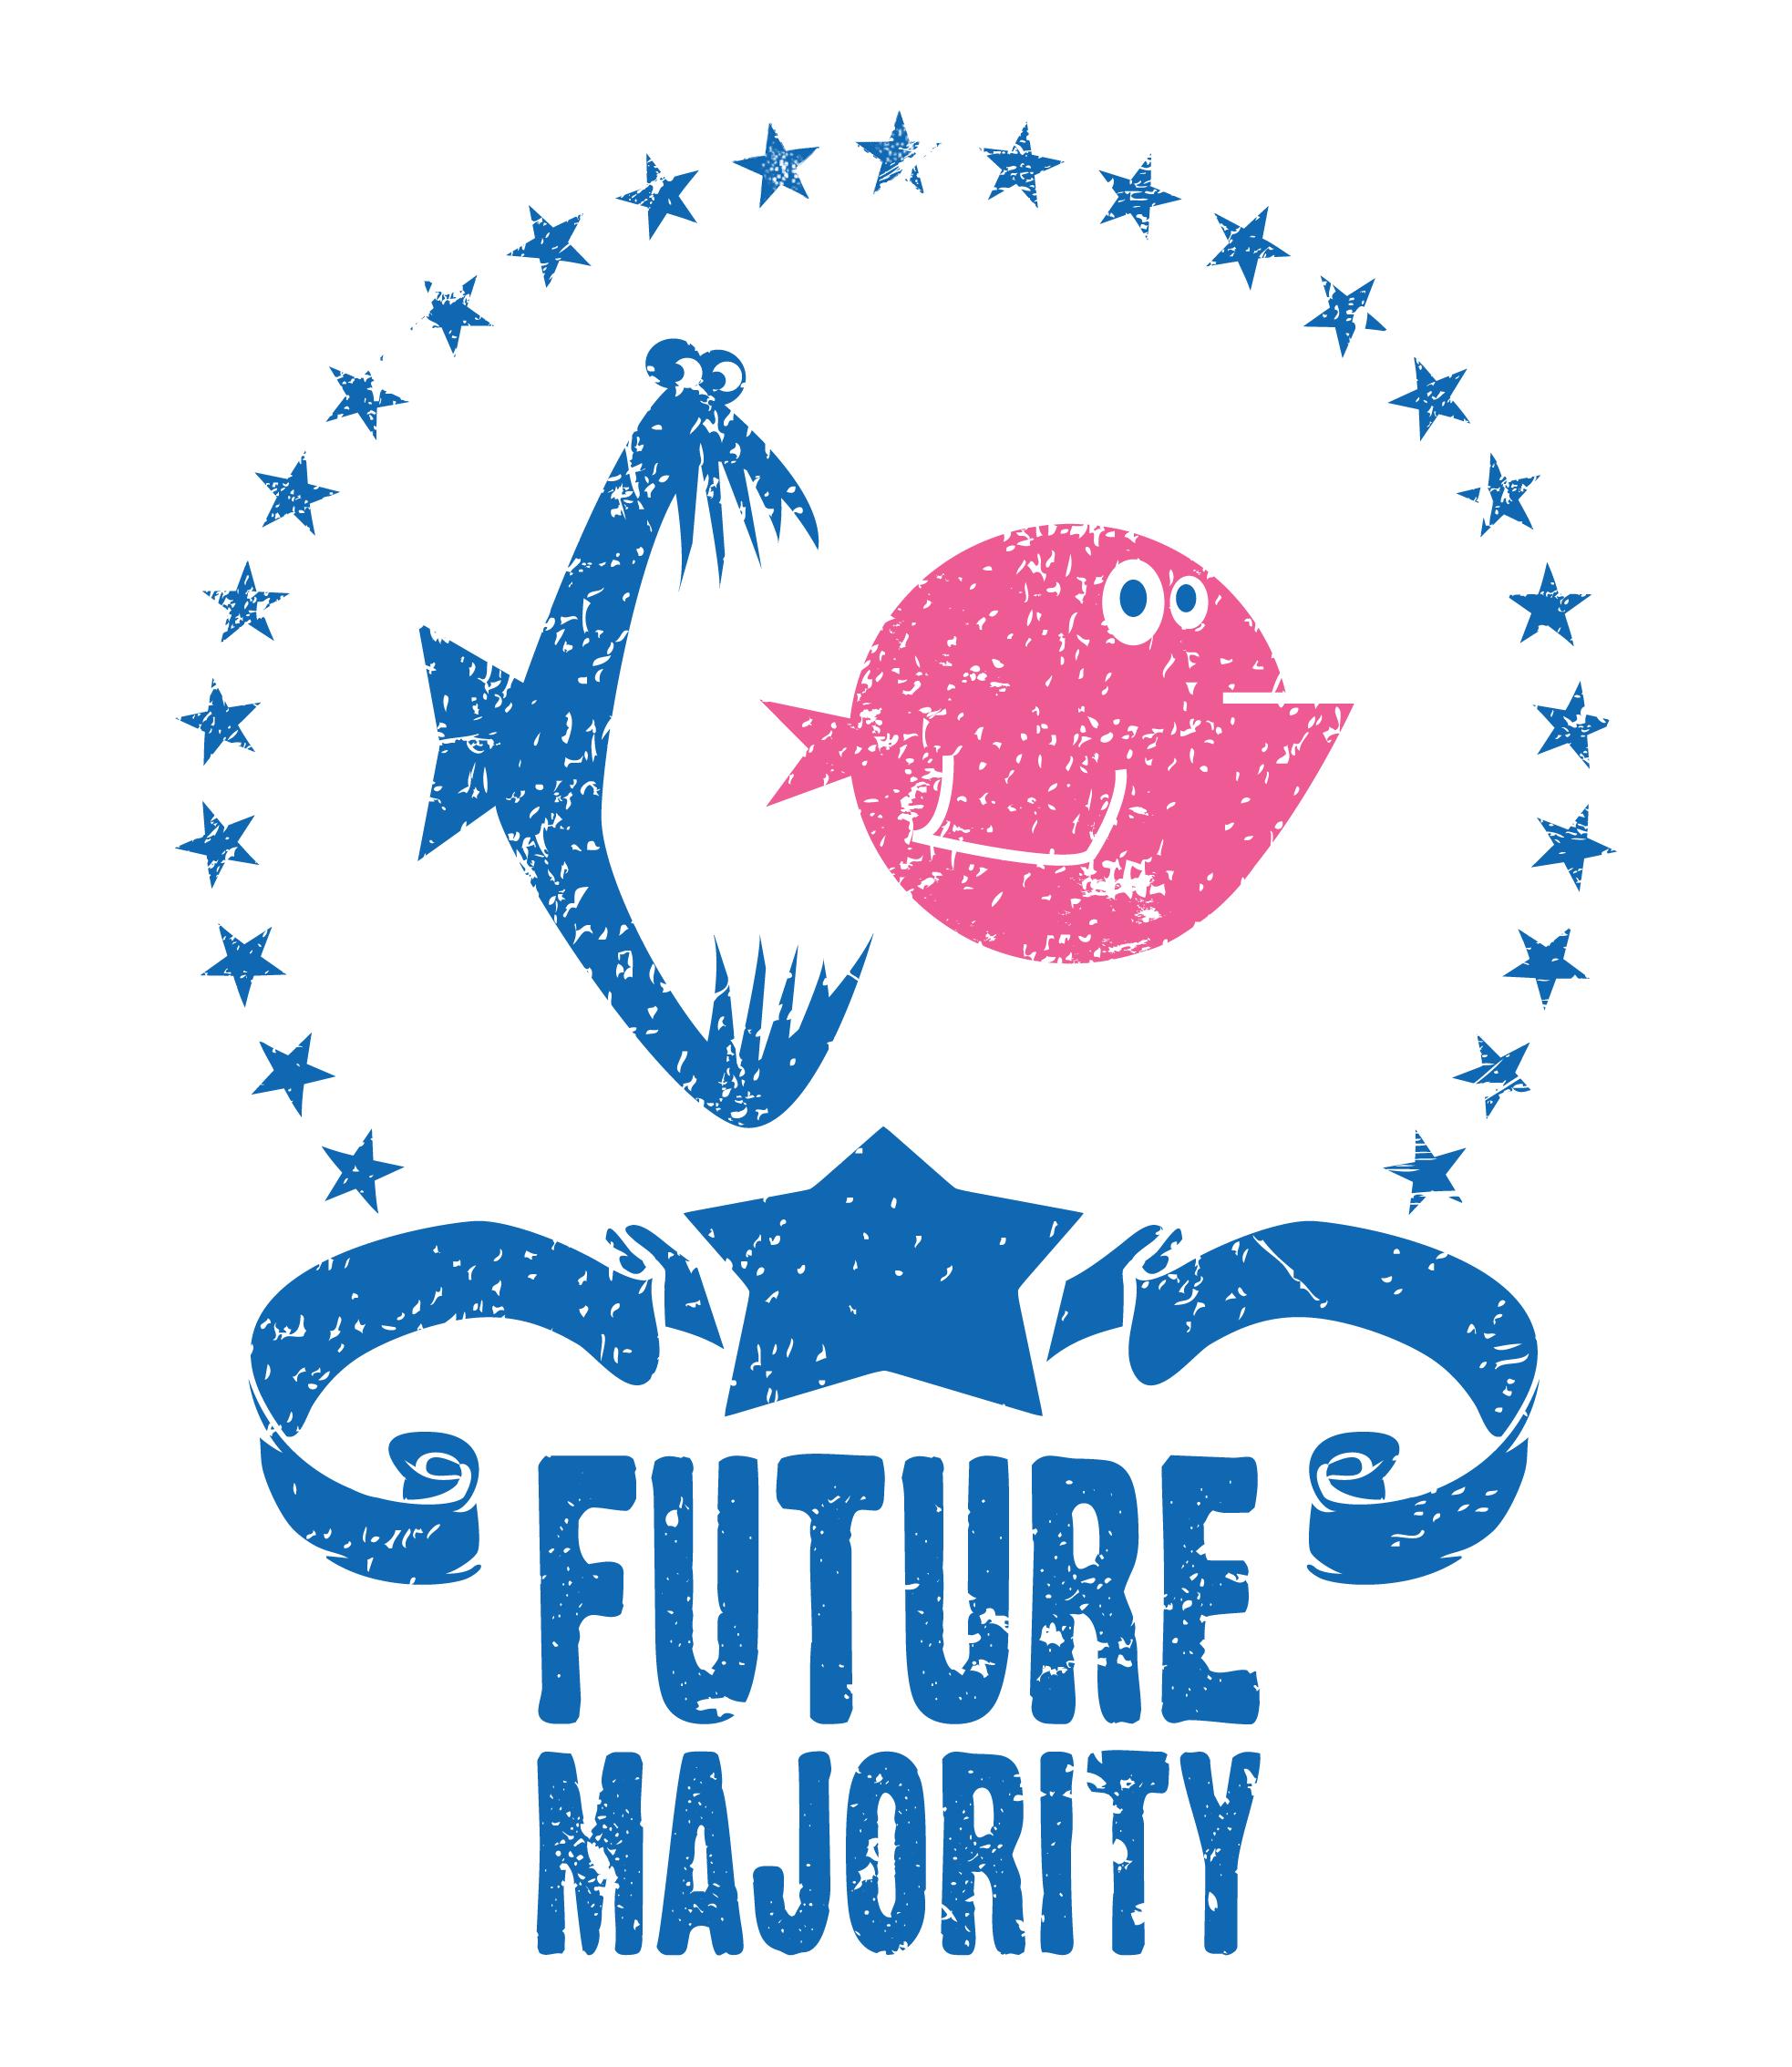 Future Majority